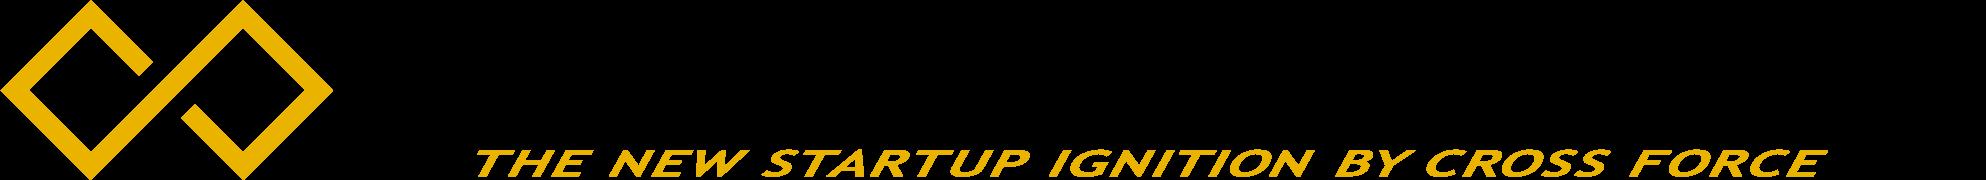 logo_Crostage